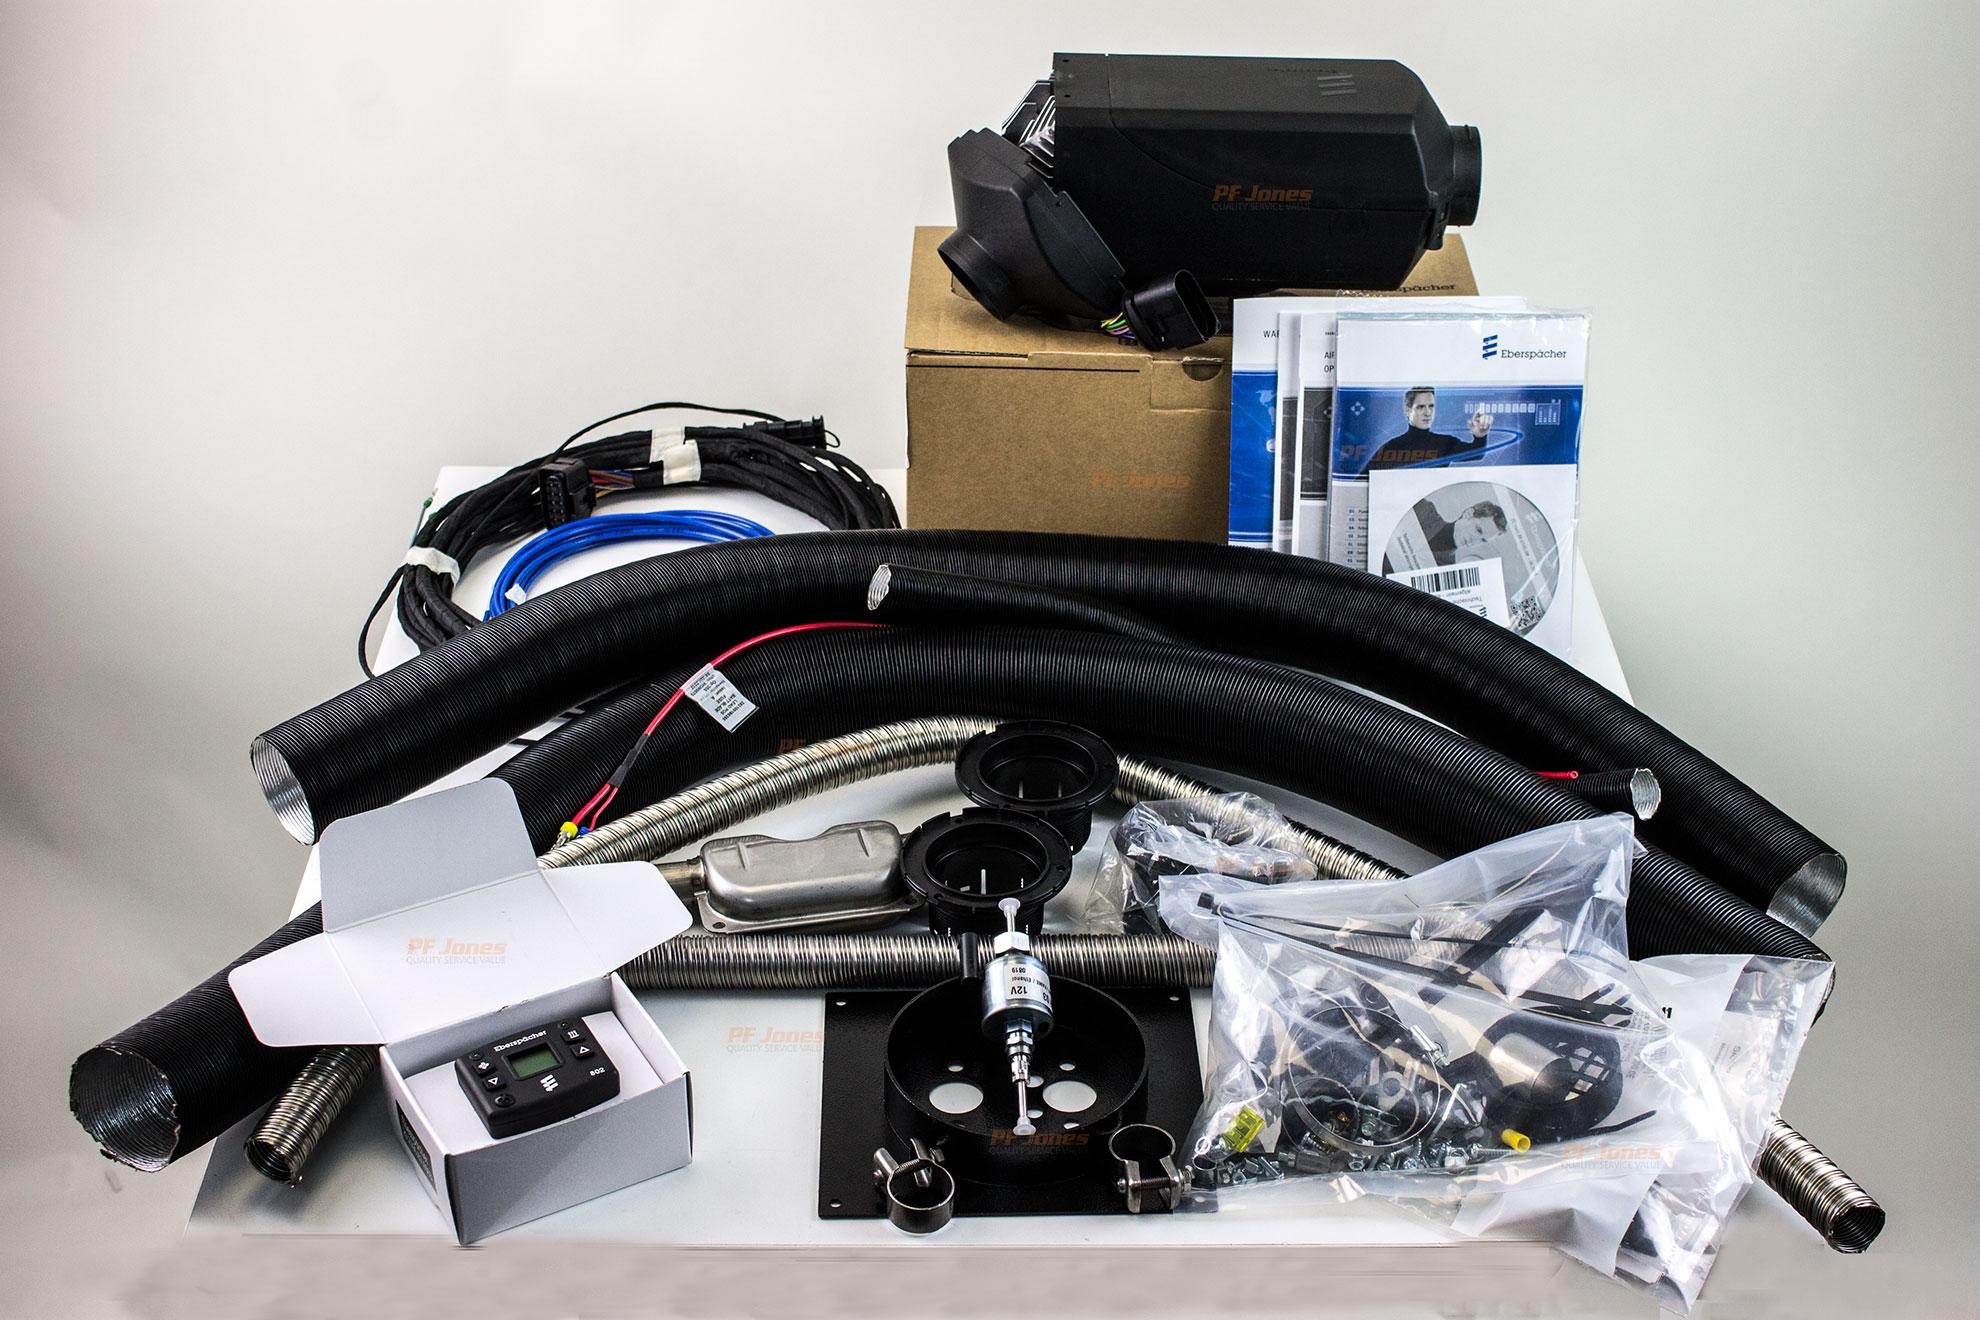 Eberspacher Airtronic D2L Motorhome kit with 802 Modulator